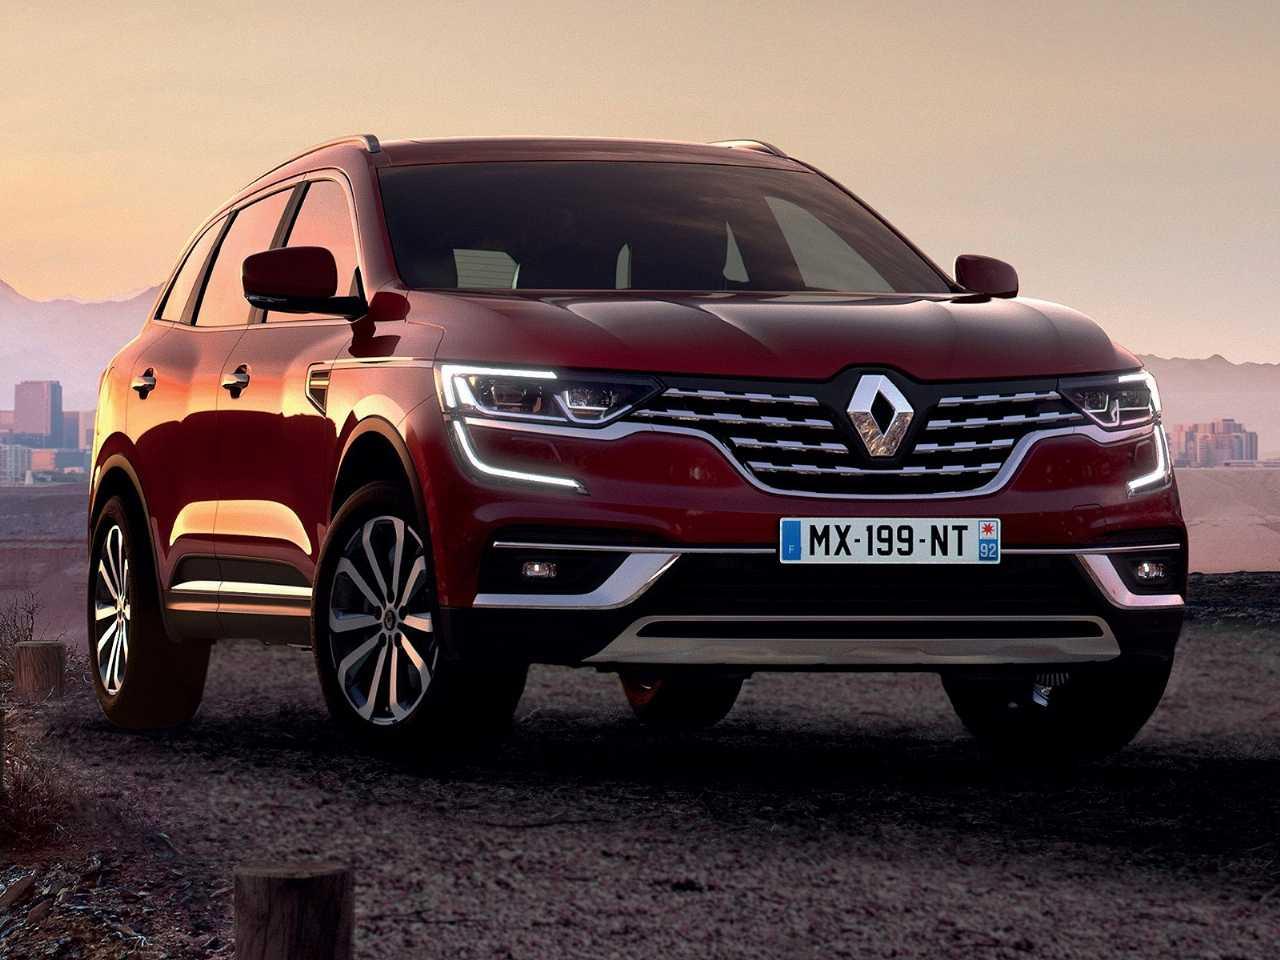 Acima o Renault Koleos 2020, que estreia facelift na Europa